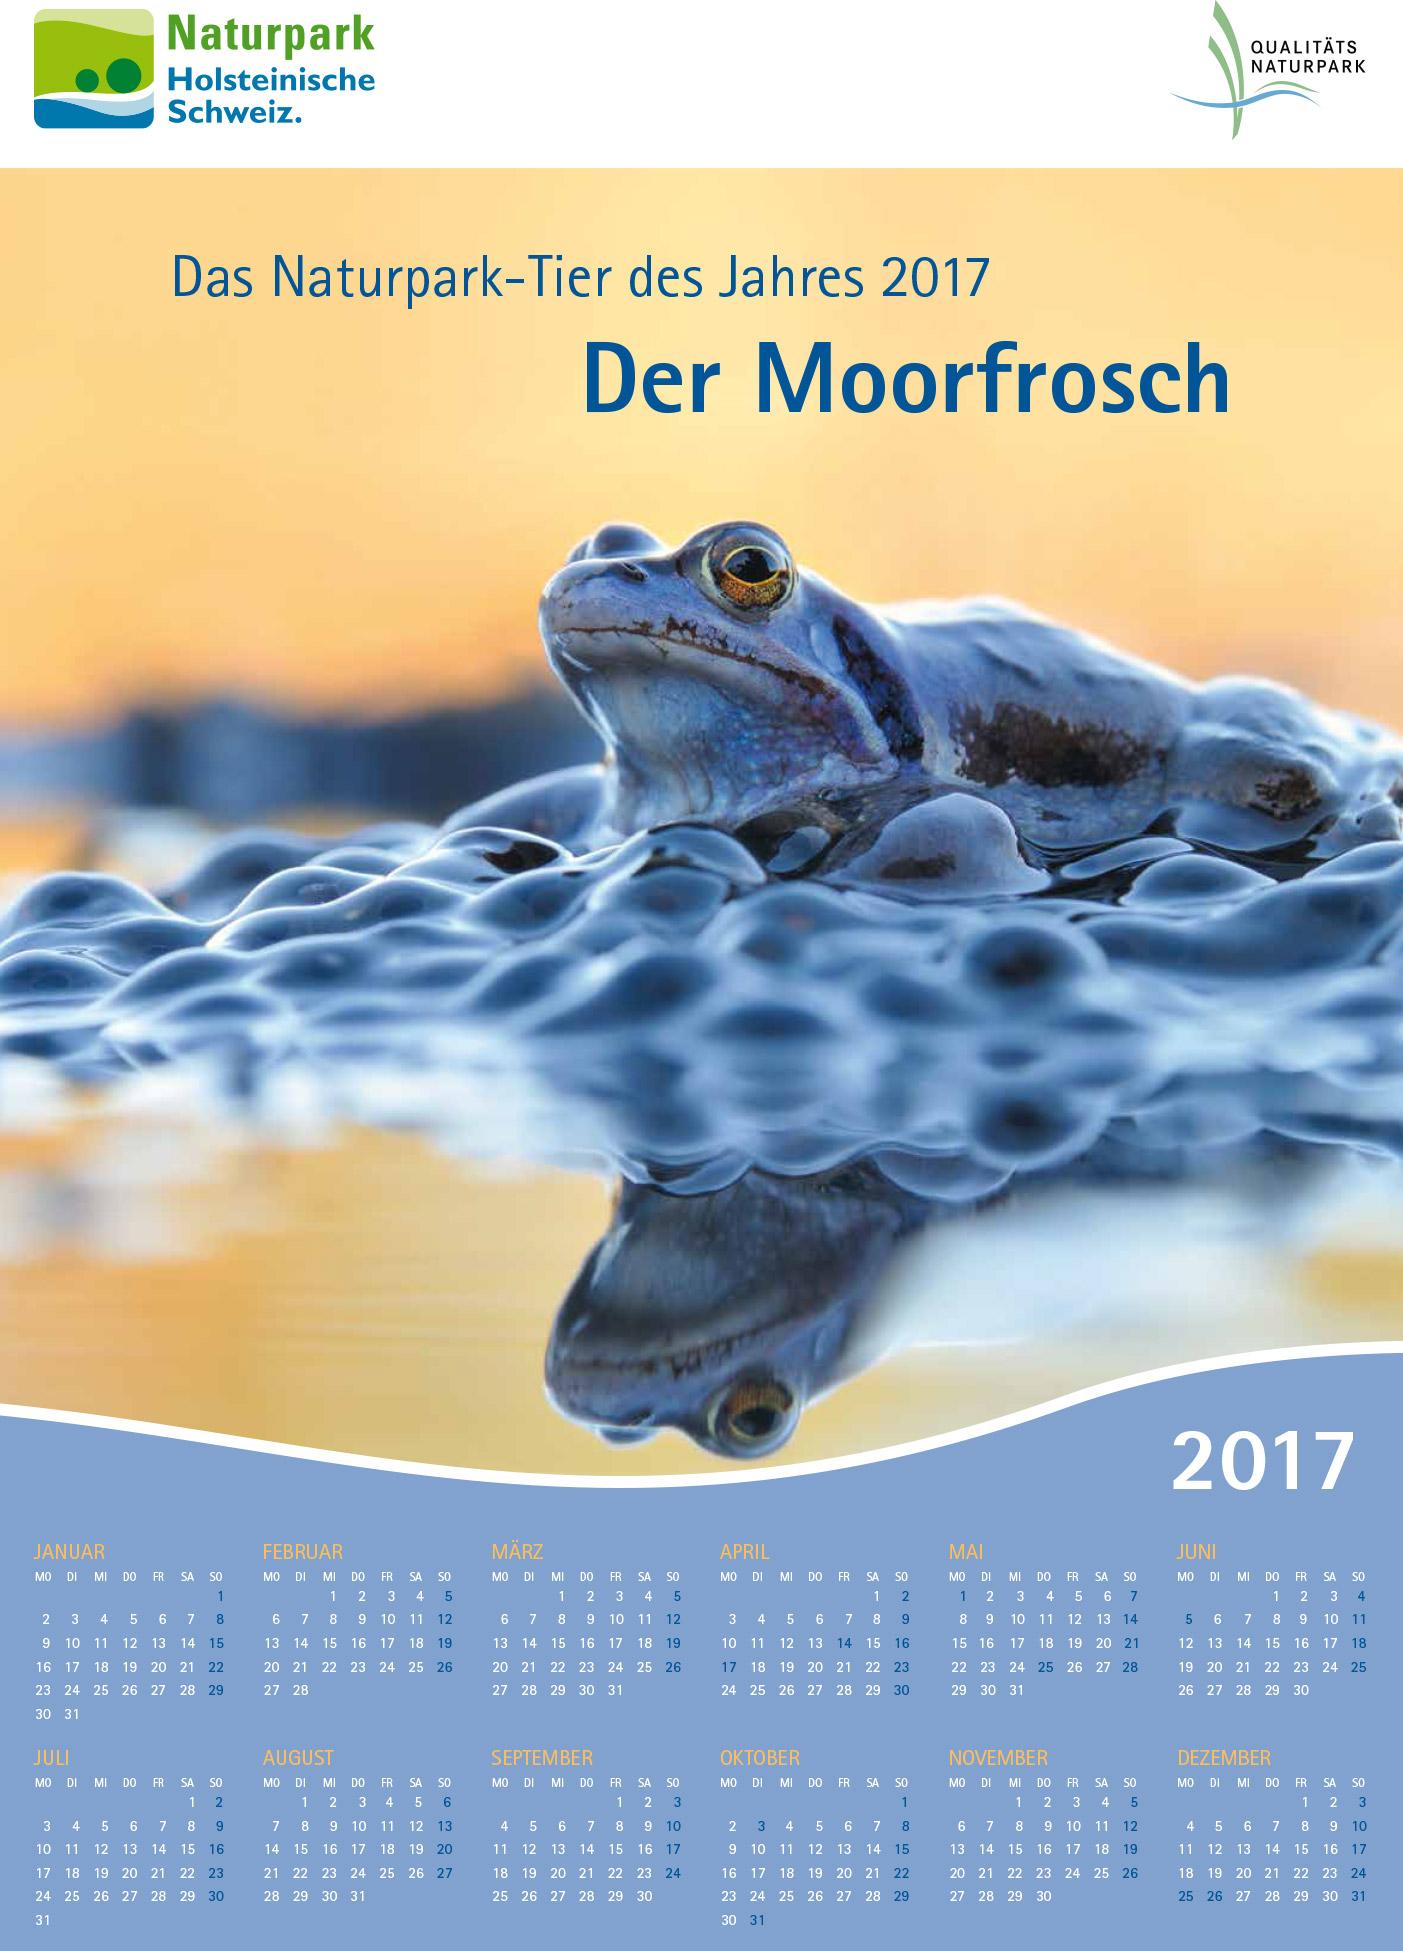 Tier des Jahres 2017 A3 web 1 Naturpark Tier des Jahres 2017: Der Moorfrosch